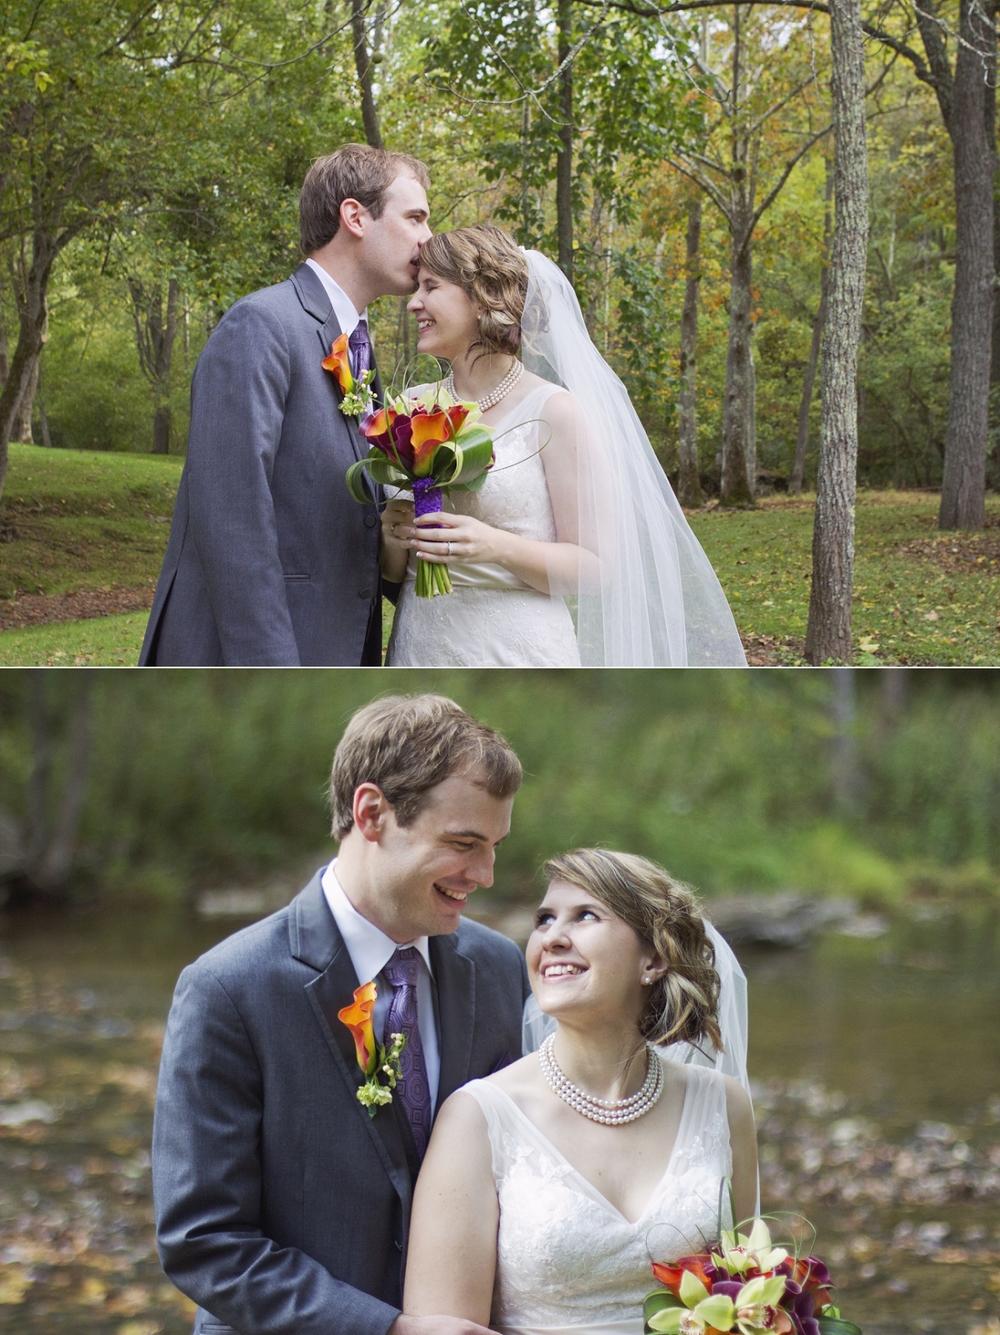 West-Virginia-Creekside-Resort-Wedding-Photos-011.jpg